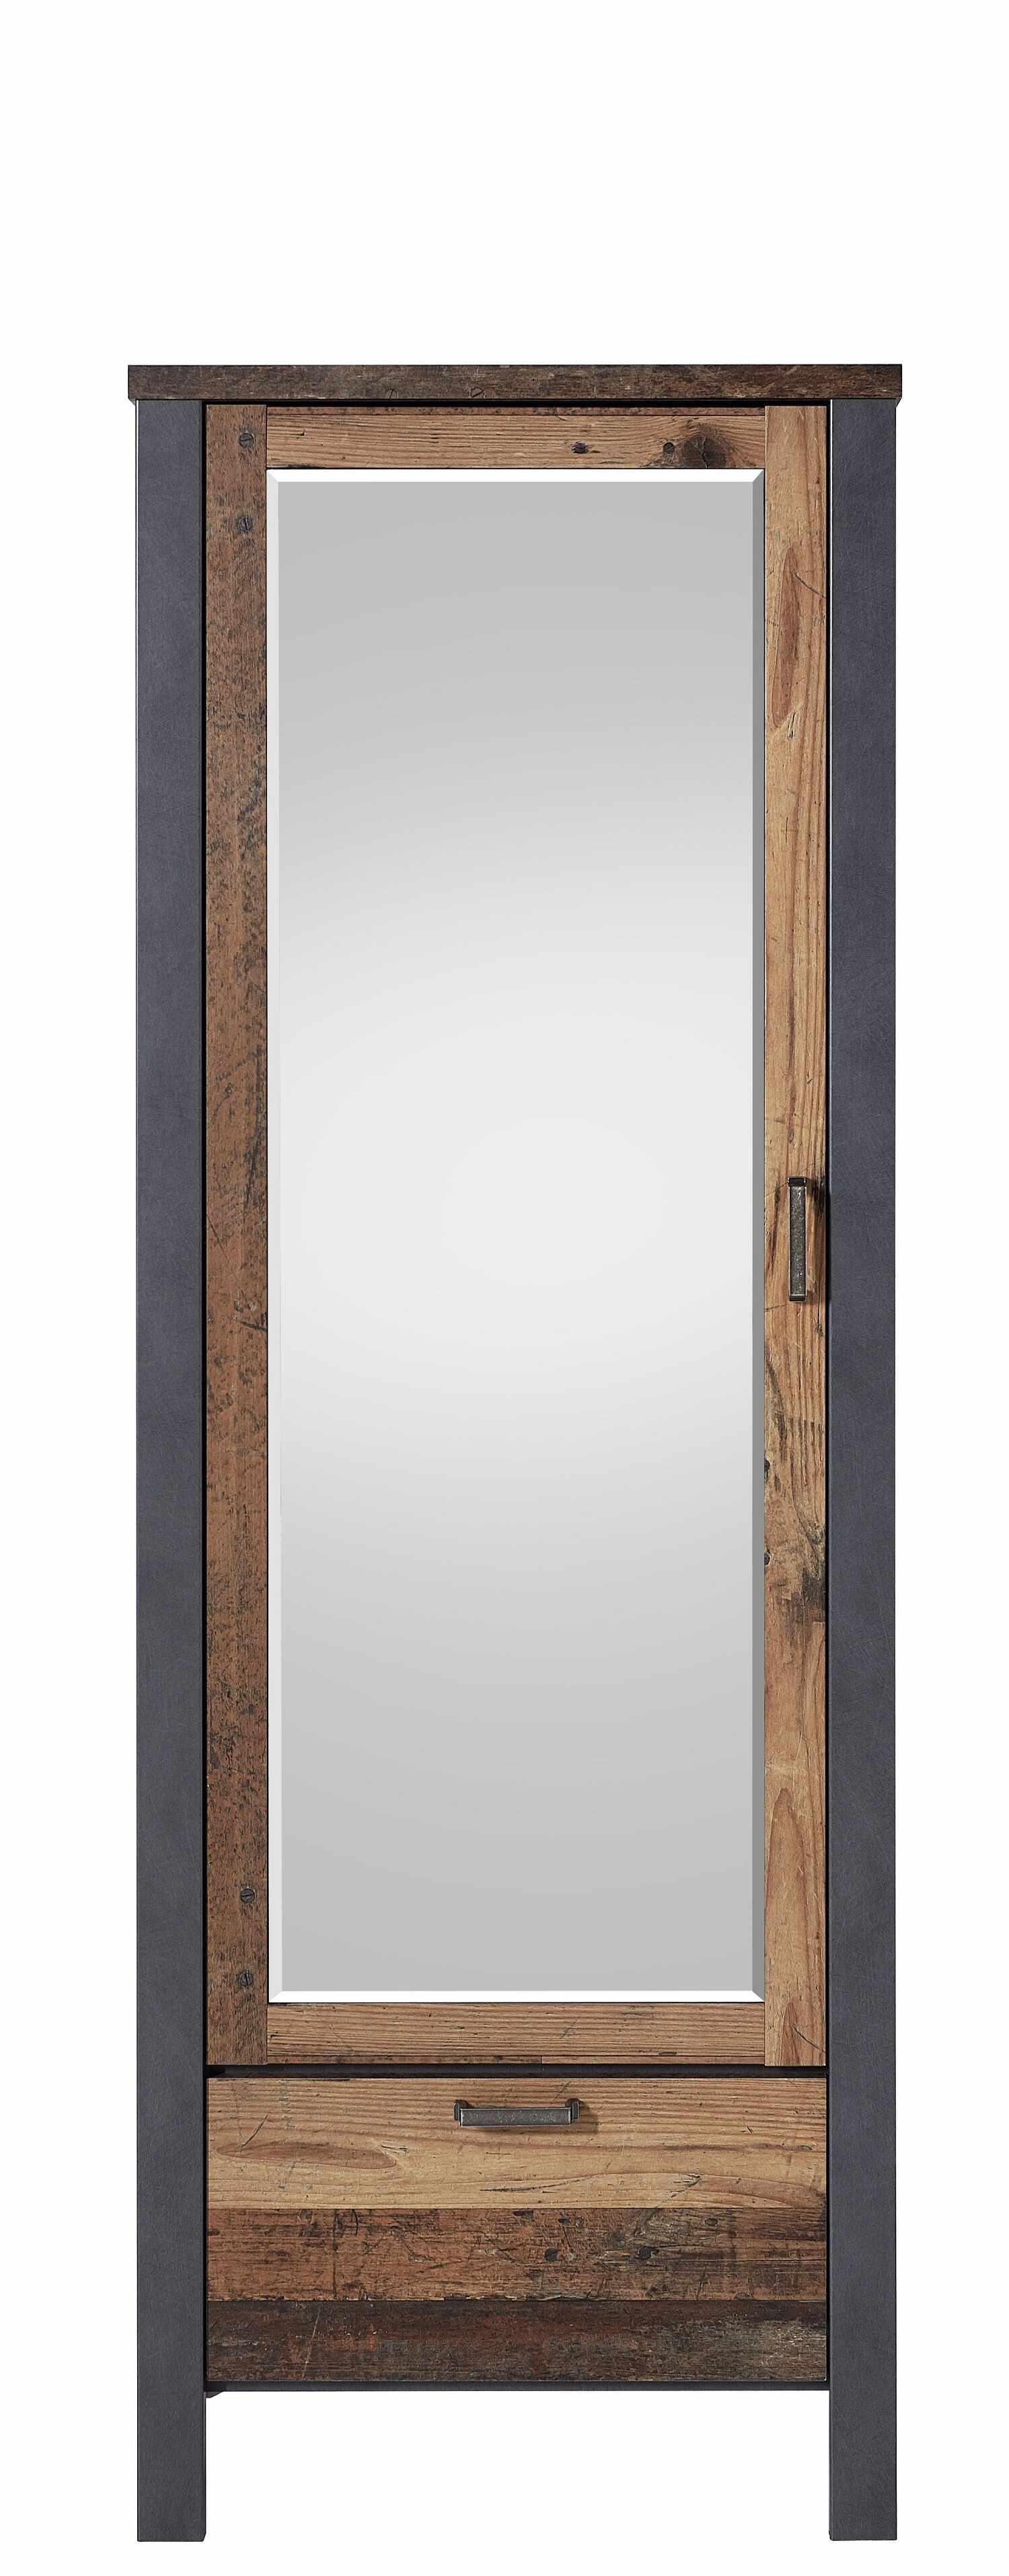 Dulap hol din pal cu oglinda, 1 usa si 1 sertar Chelsea Natural / Grafit, l69xA40xH194 cm la pret 2095 lei